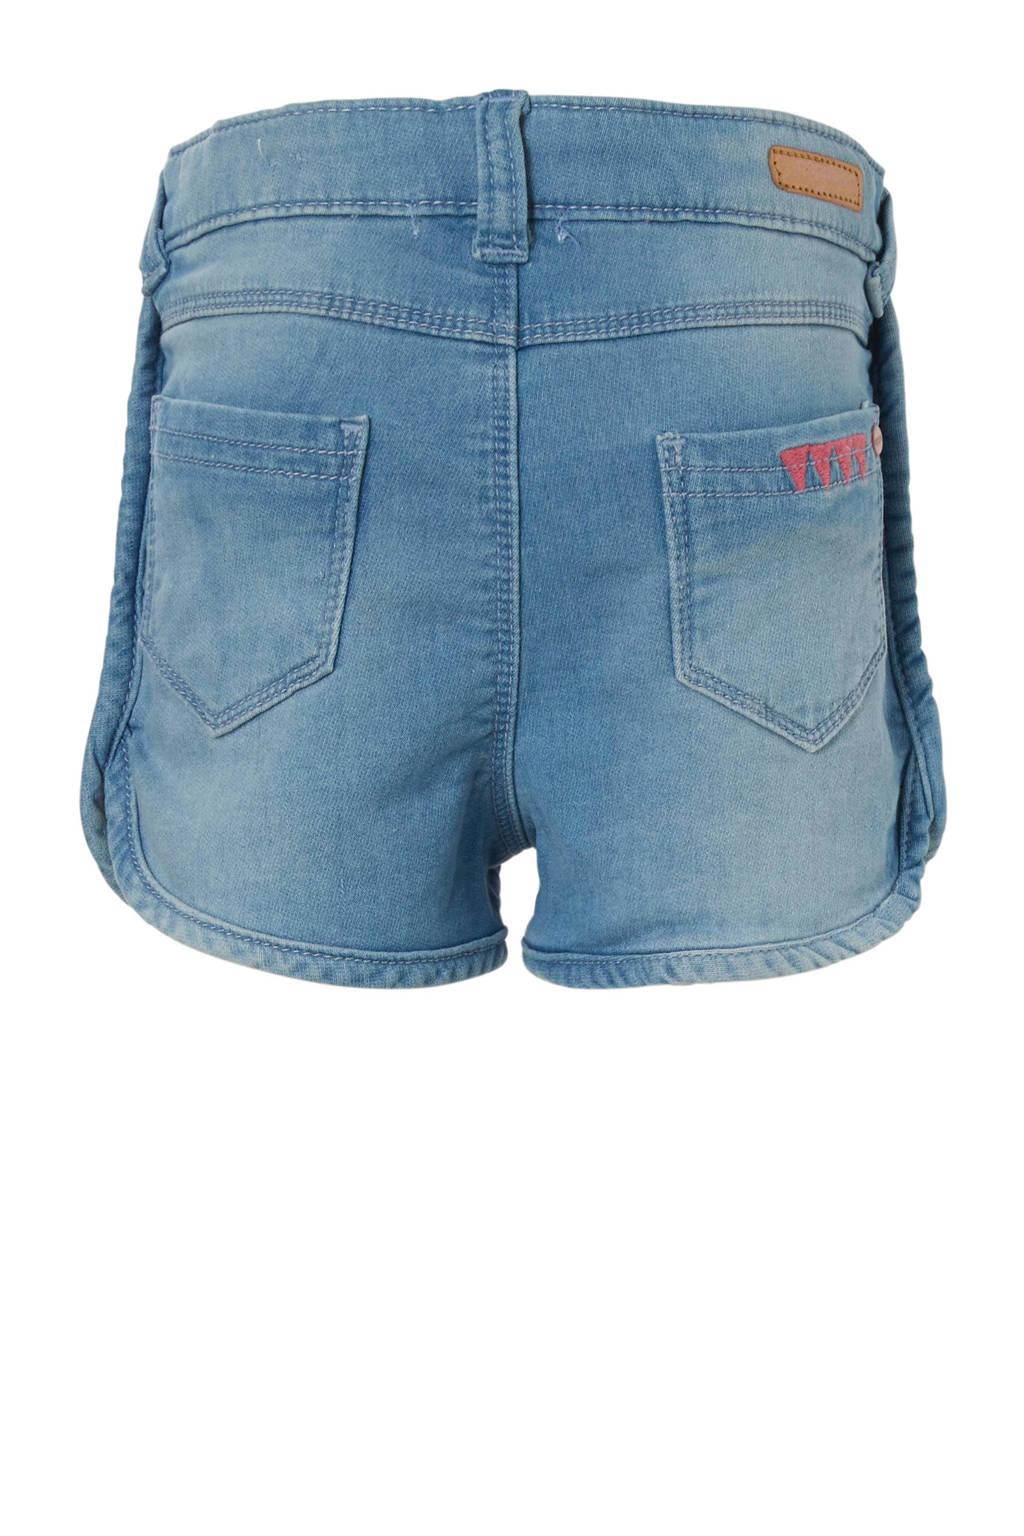 Noppies jeans short Rockingham, Light denim